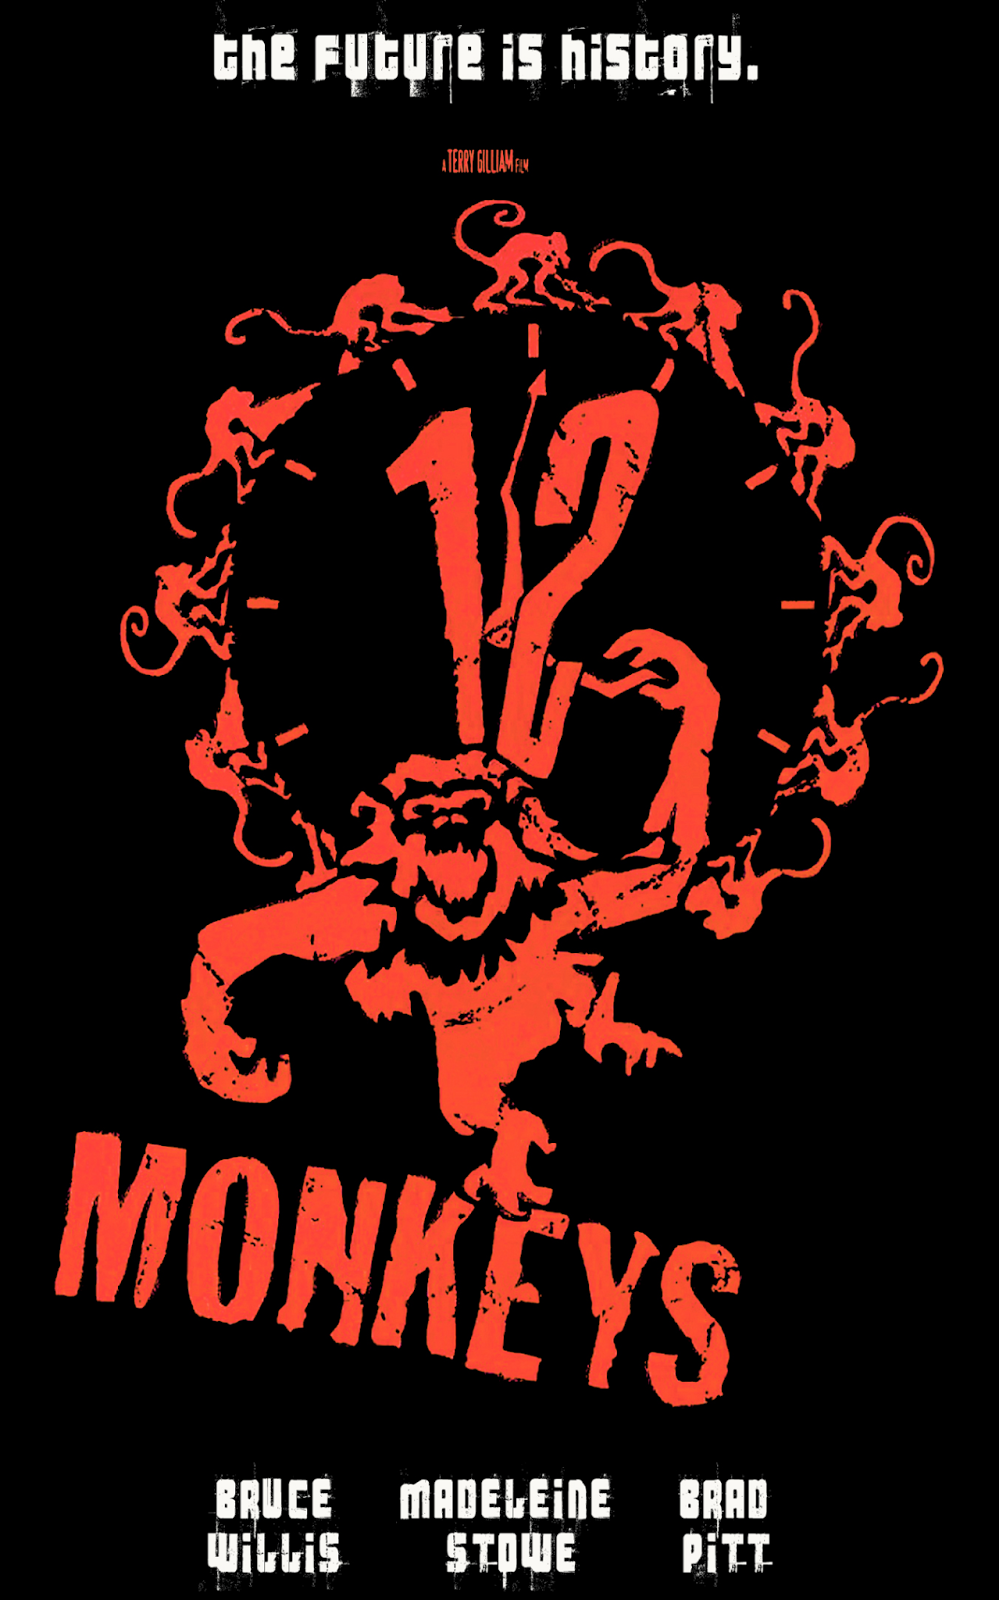 12 monkeys 1995 full movie free 123movies